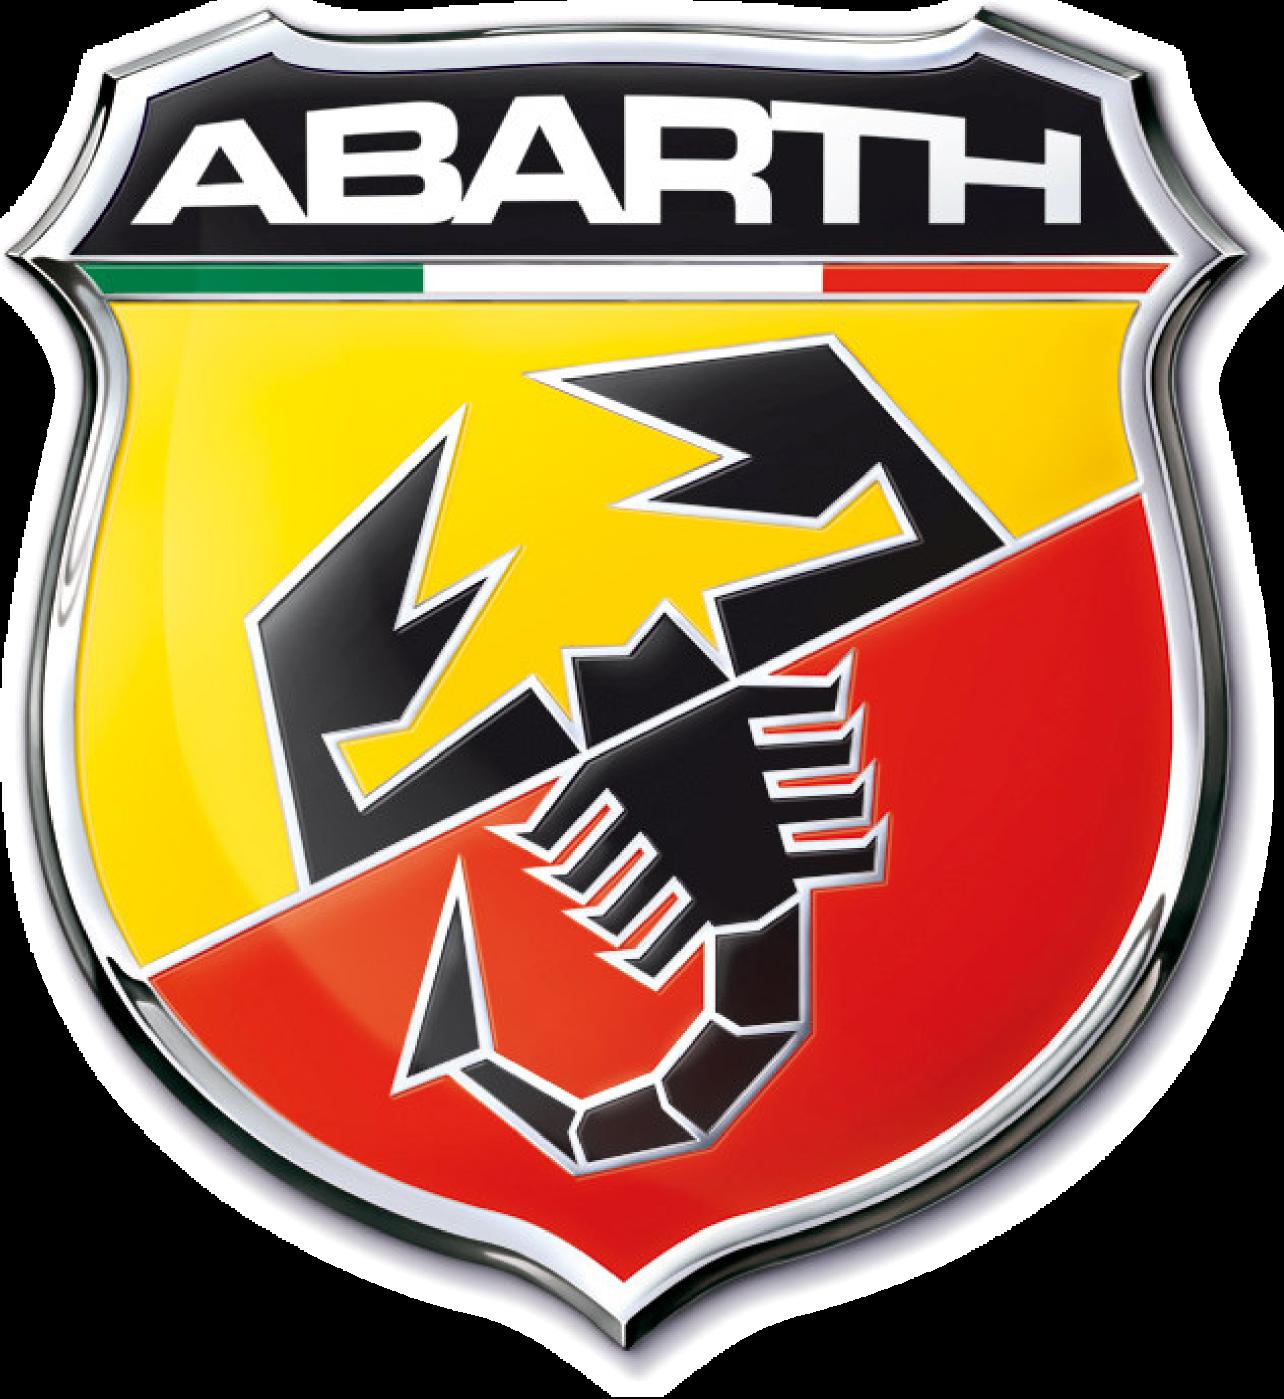 Marque de voiture - Abarth